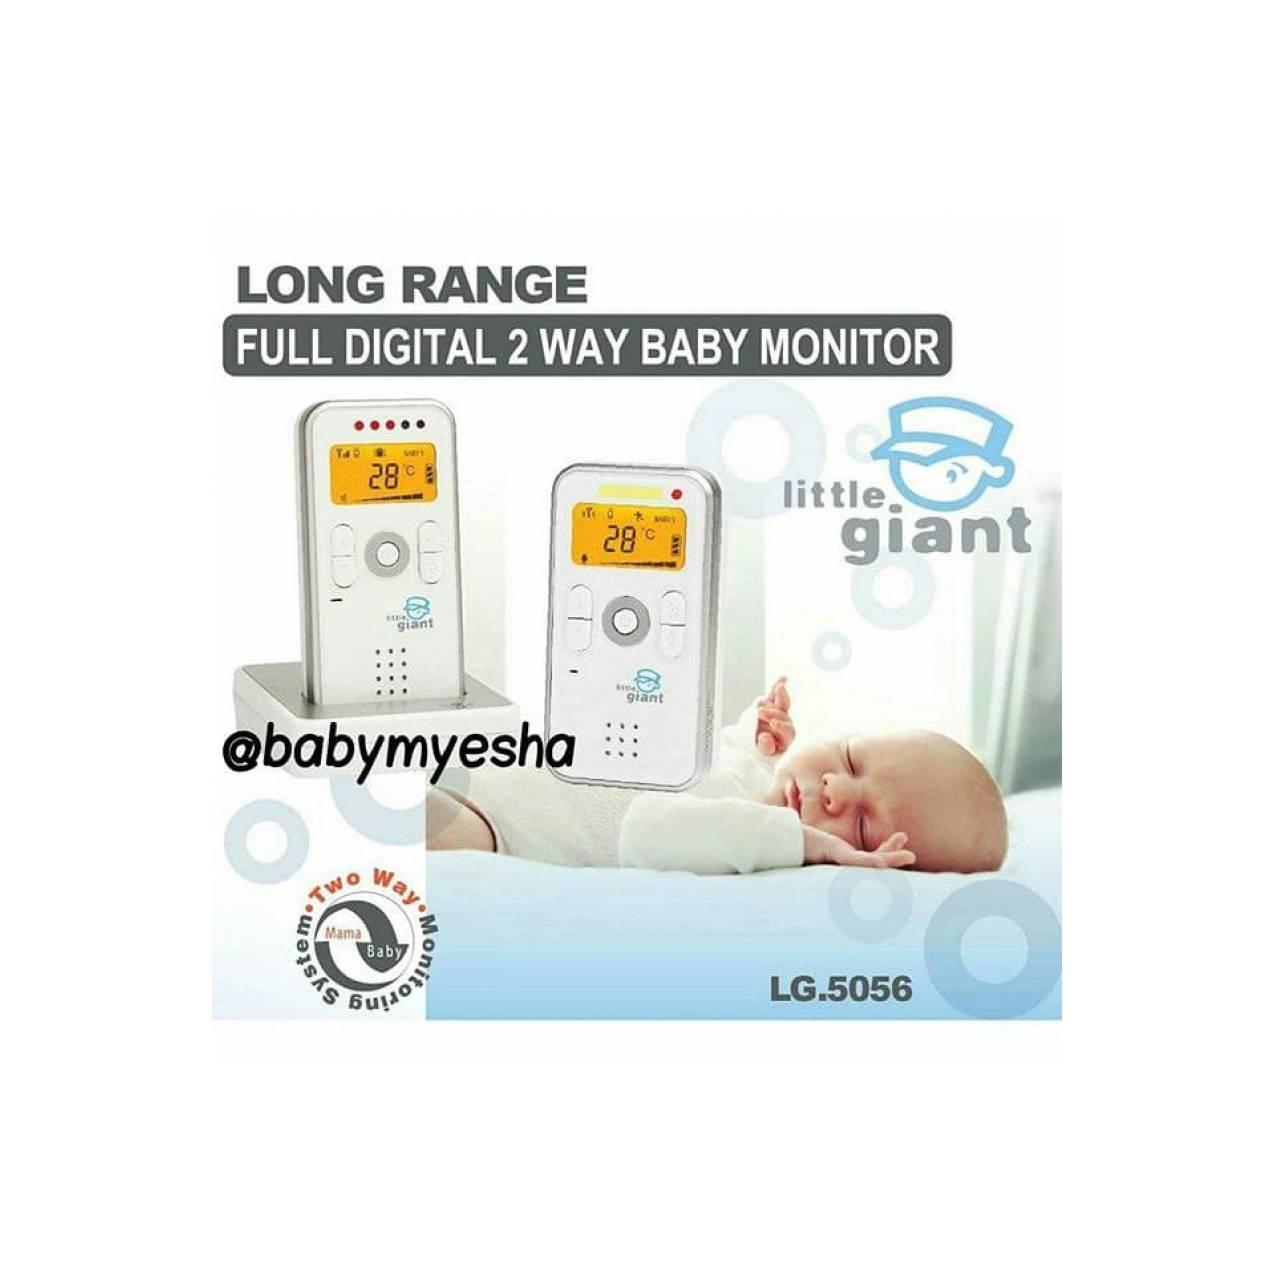 Little Giant Two Way Digital Baby Monitor Alat Kontrol Bayi 2 Arah